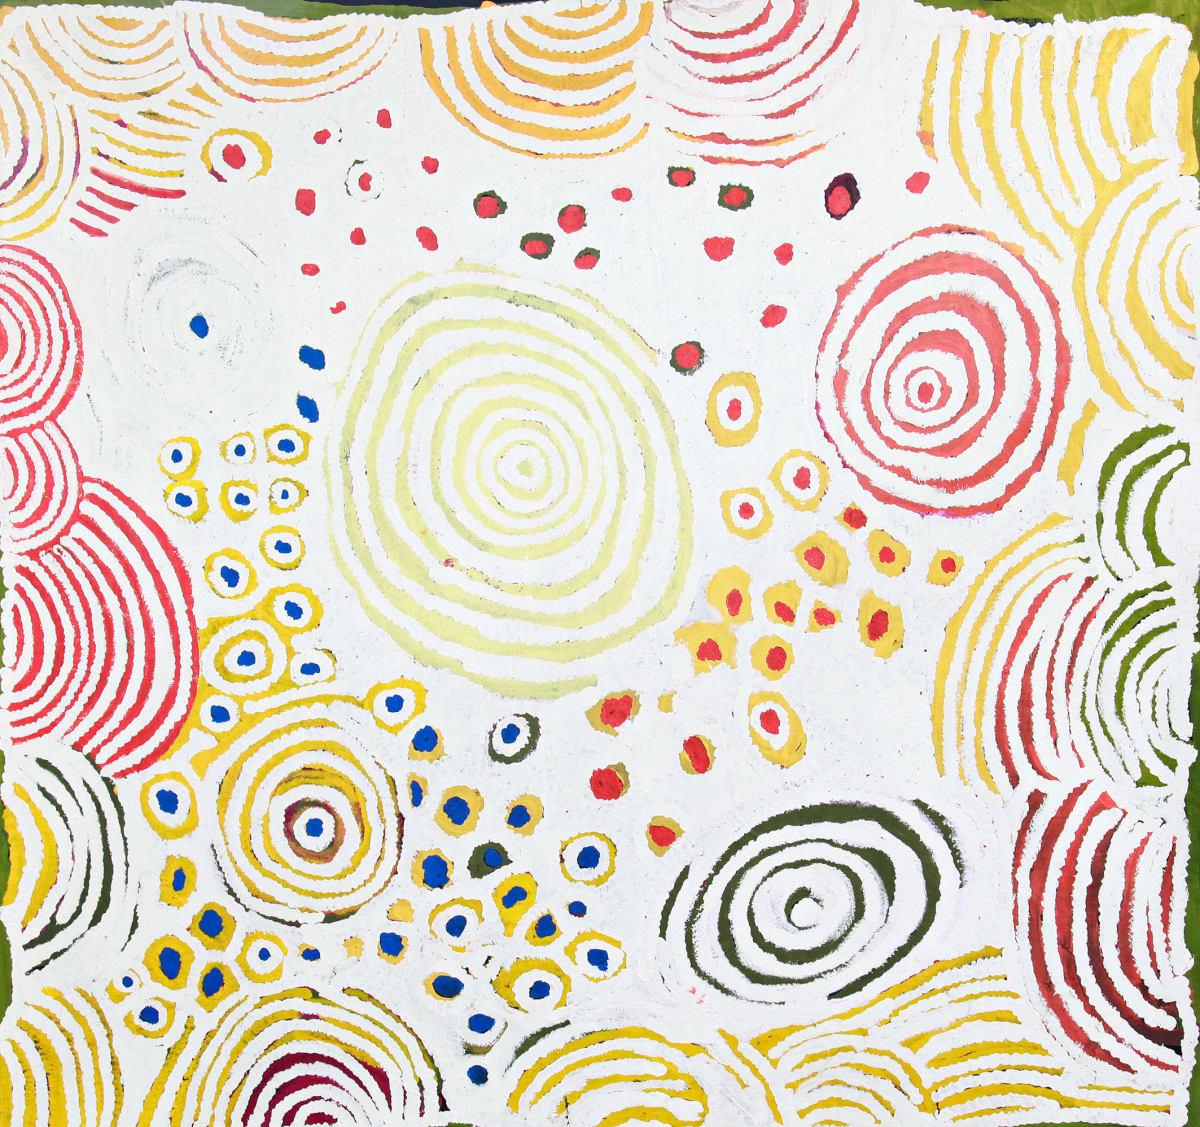 Katjarra Butler Ngamurru acrylic on canvas 140 x 131 cm